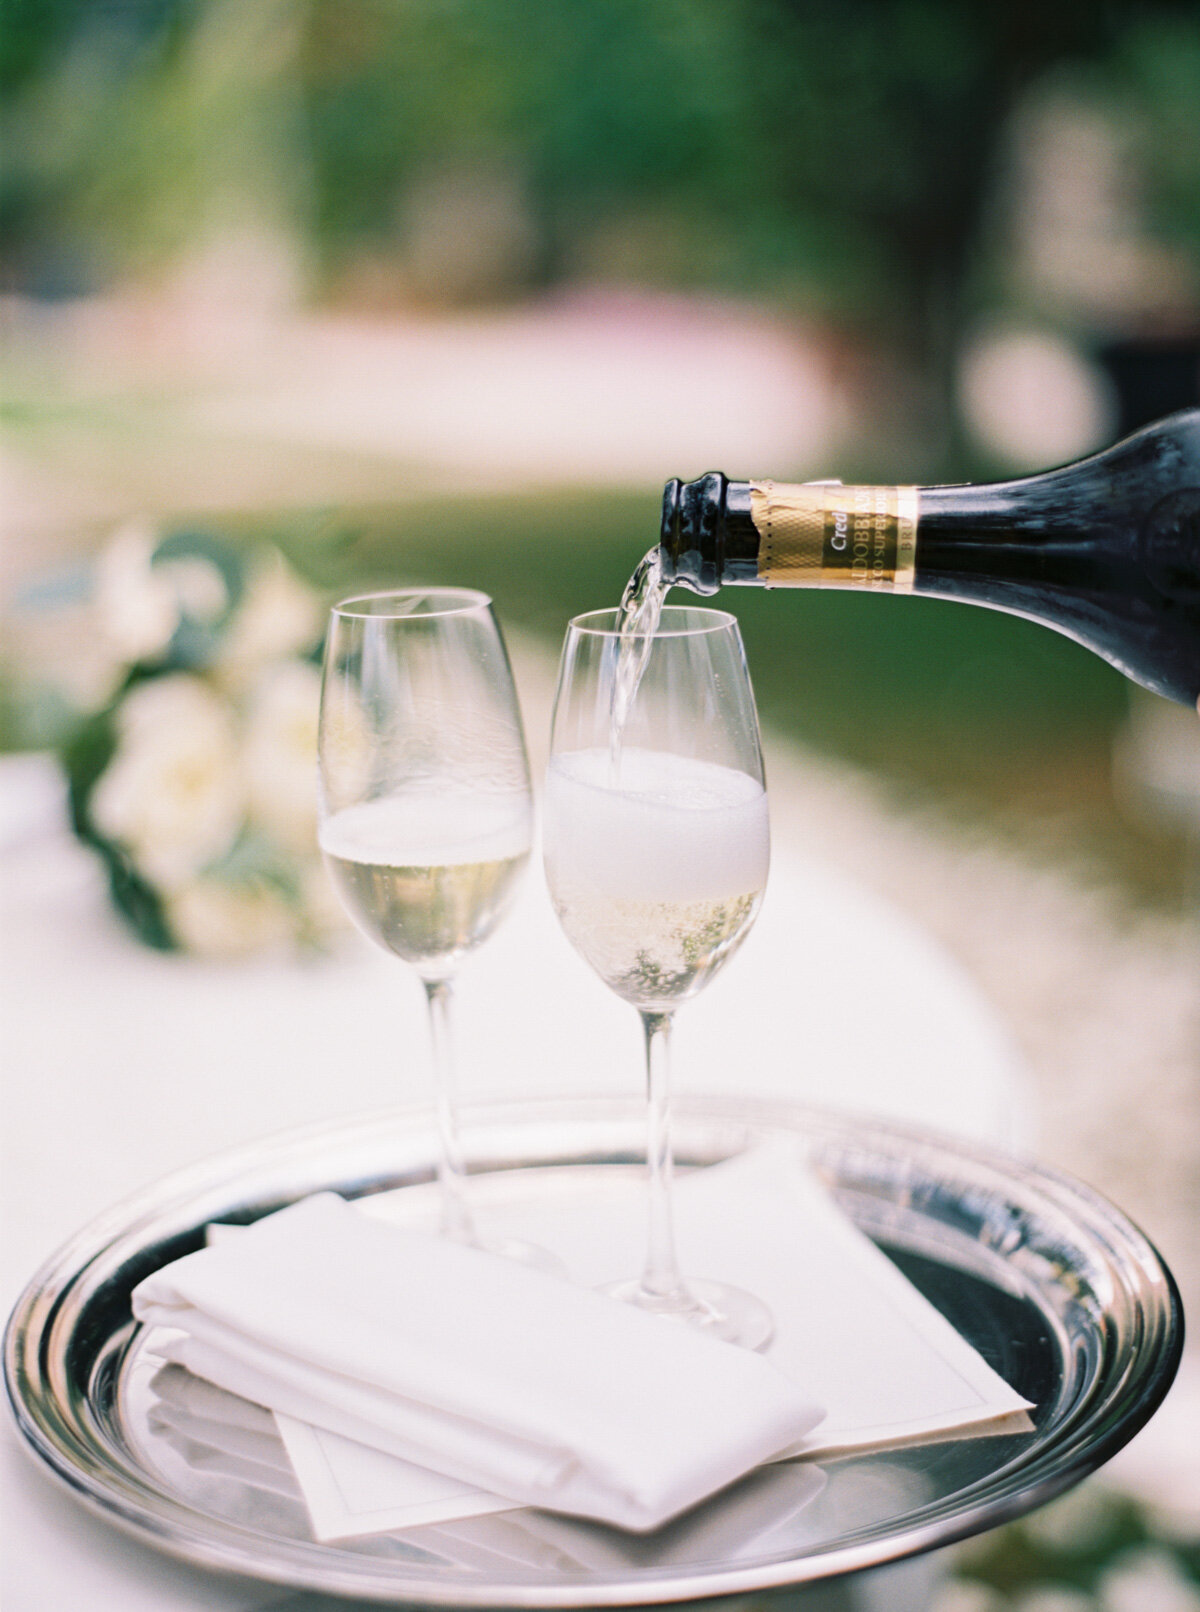 Belmond-Hotel-Caruso-ravello-elopement-Katie-Grant-destination-wedding (32 of 50).jpg